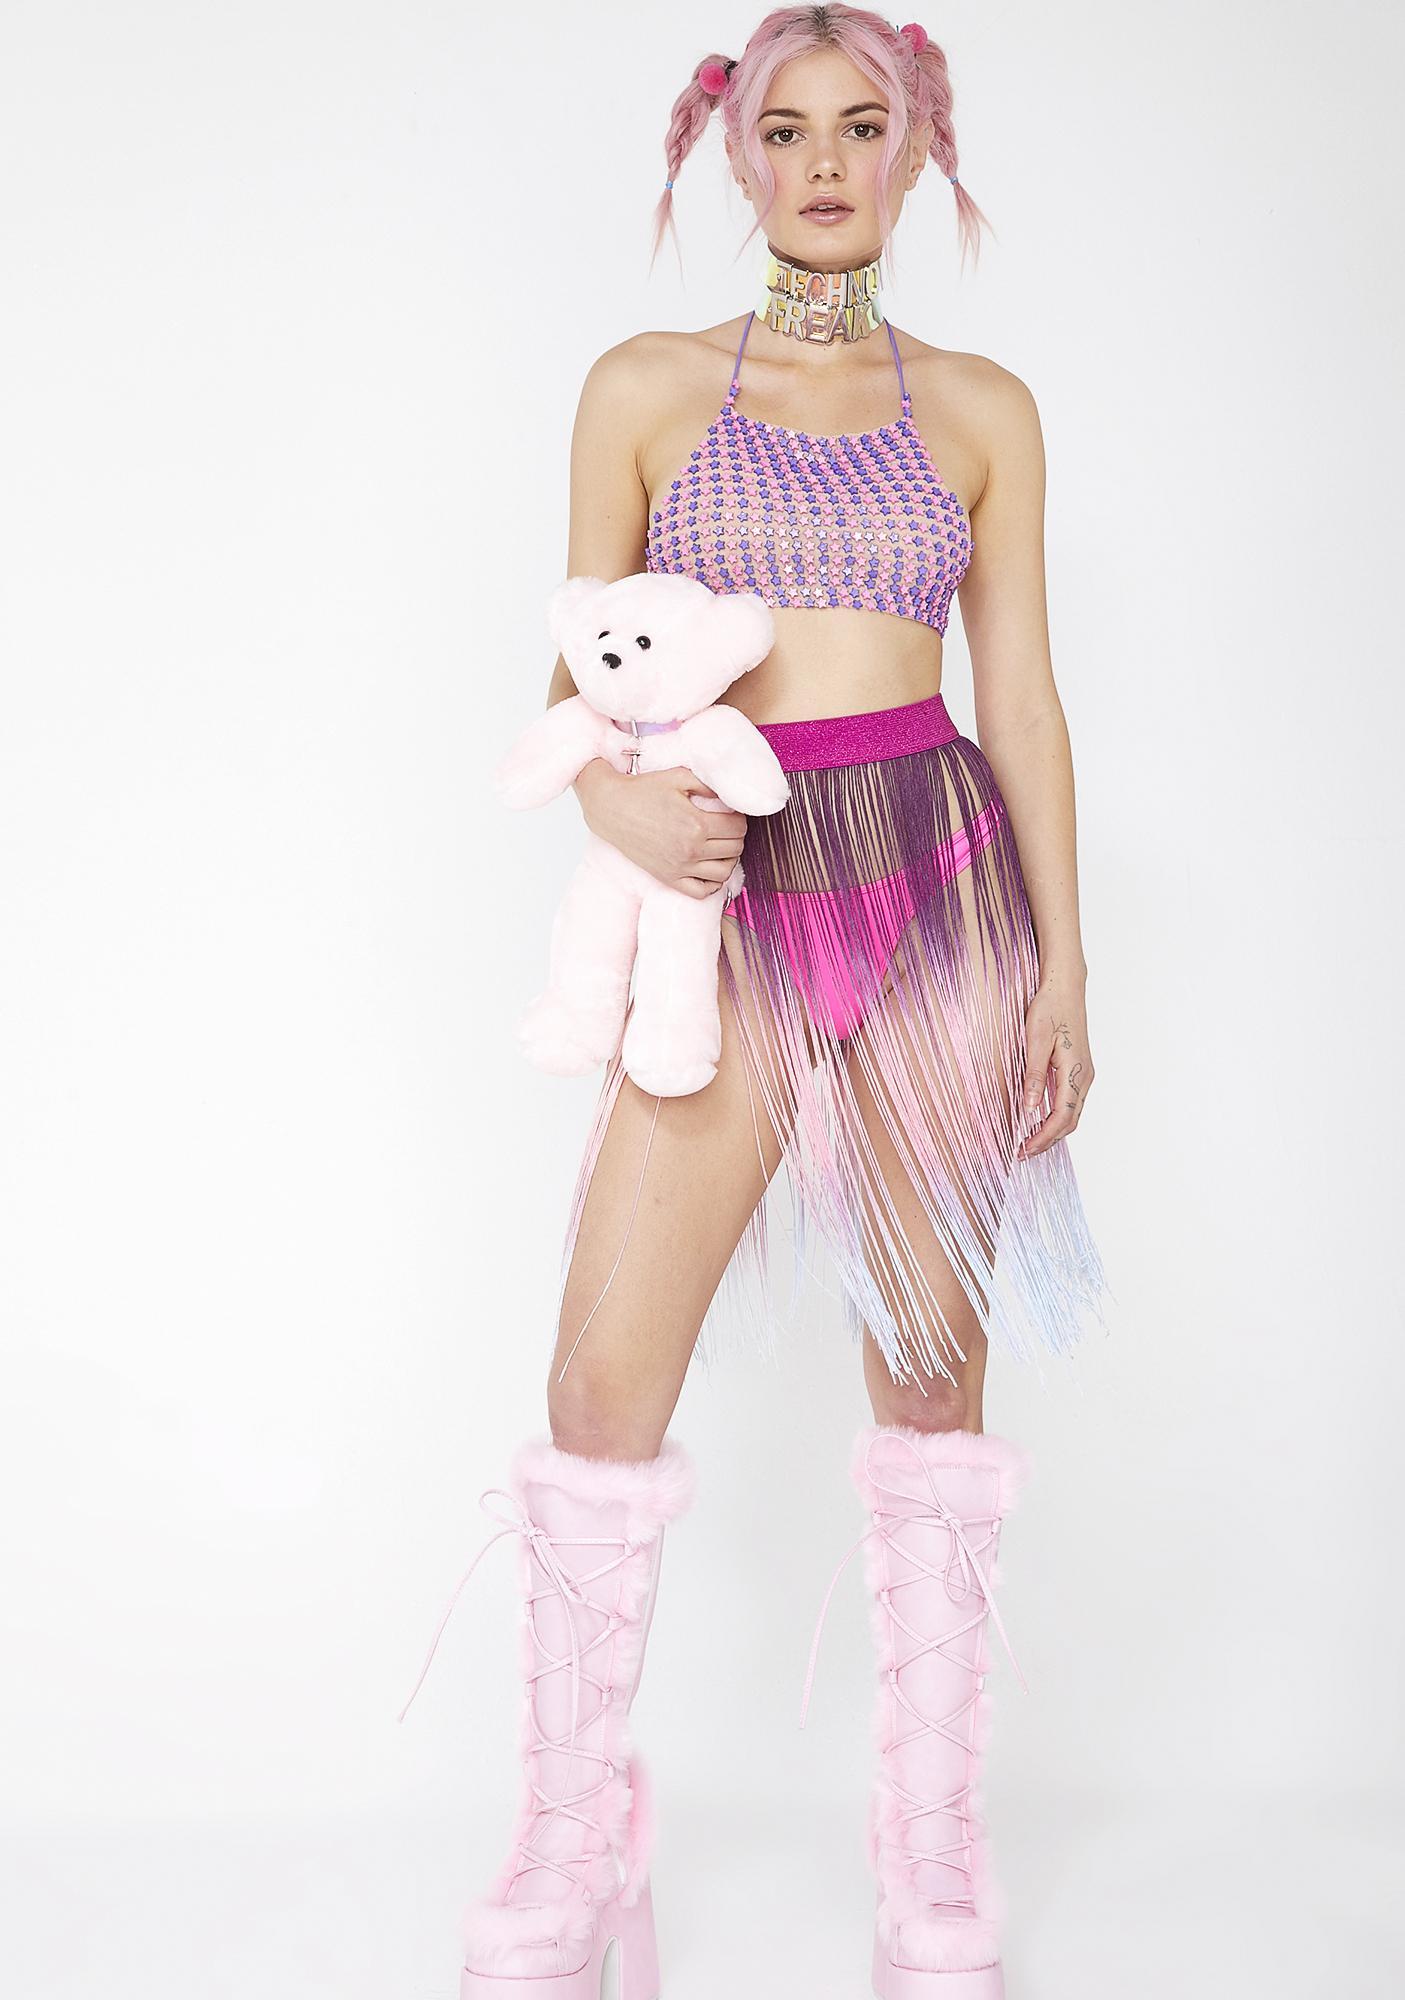 Club Exx Pixie Cosmic Candy Halter Top